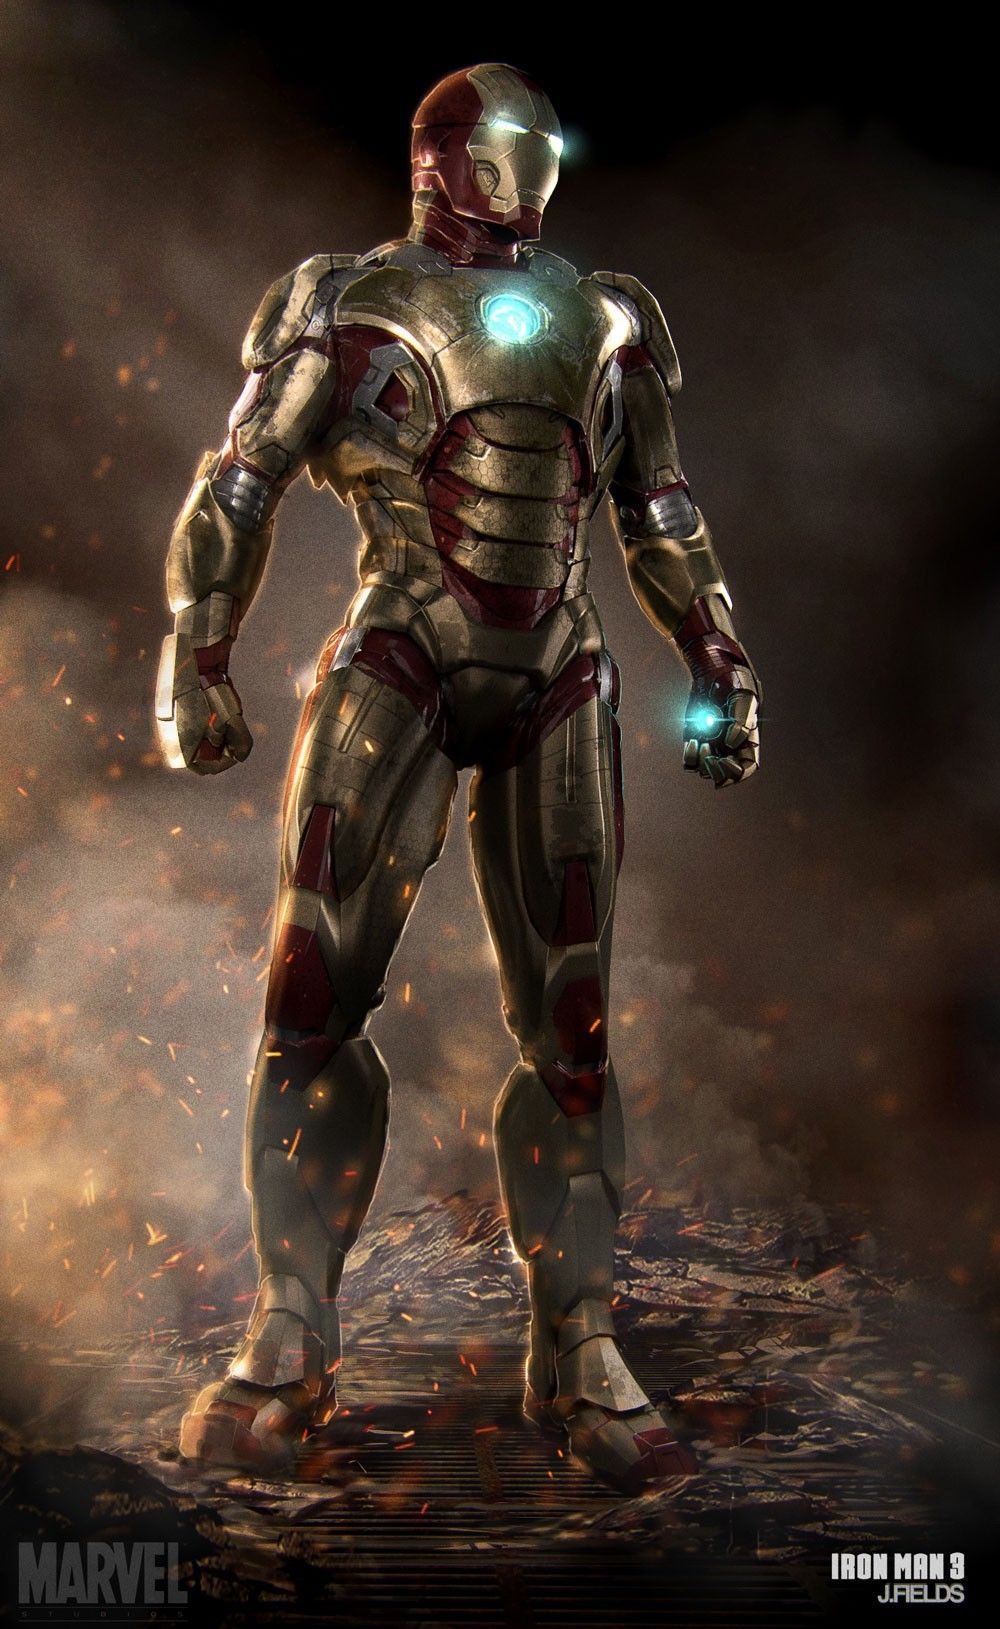 Iron Man Artwork Marvel Comics 3 Mark 42 Wallpaper Iron Man Artwork Iron Man Wallpaper Iron Man Armor